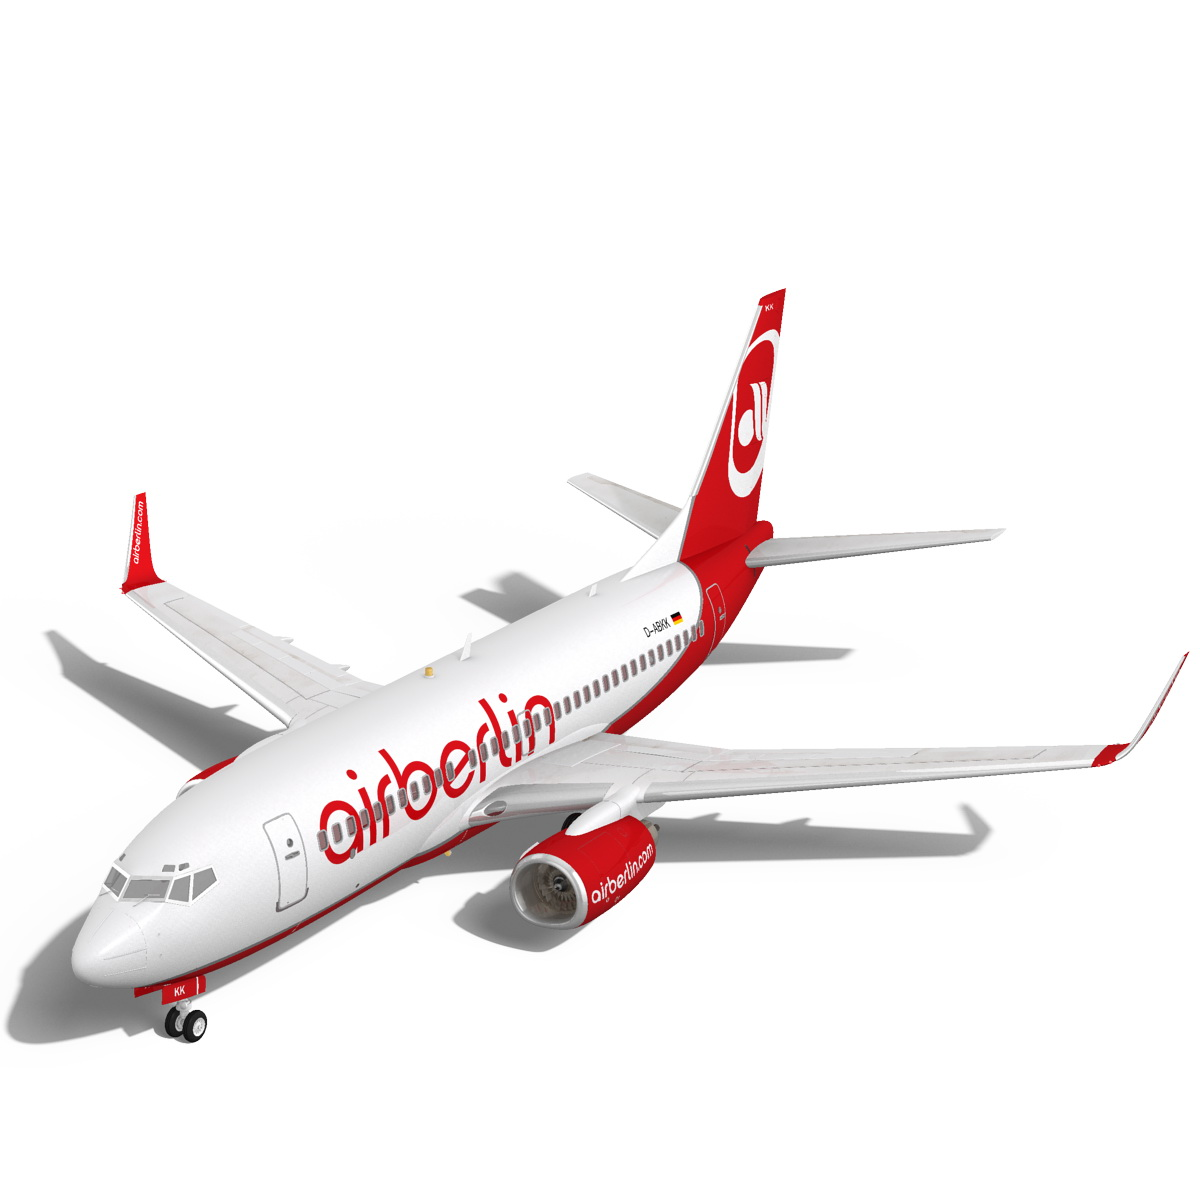 airberlin boeing 737-700w 3d model max fbx c4d le m obj 120509